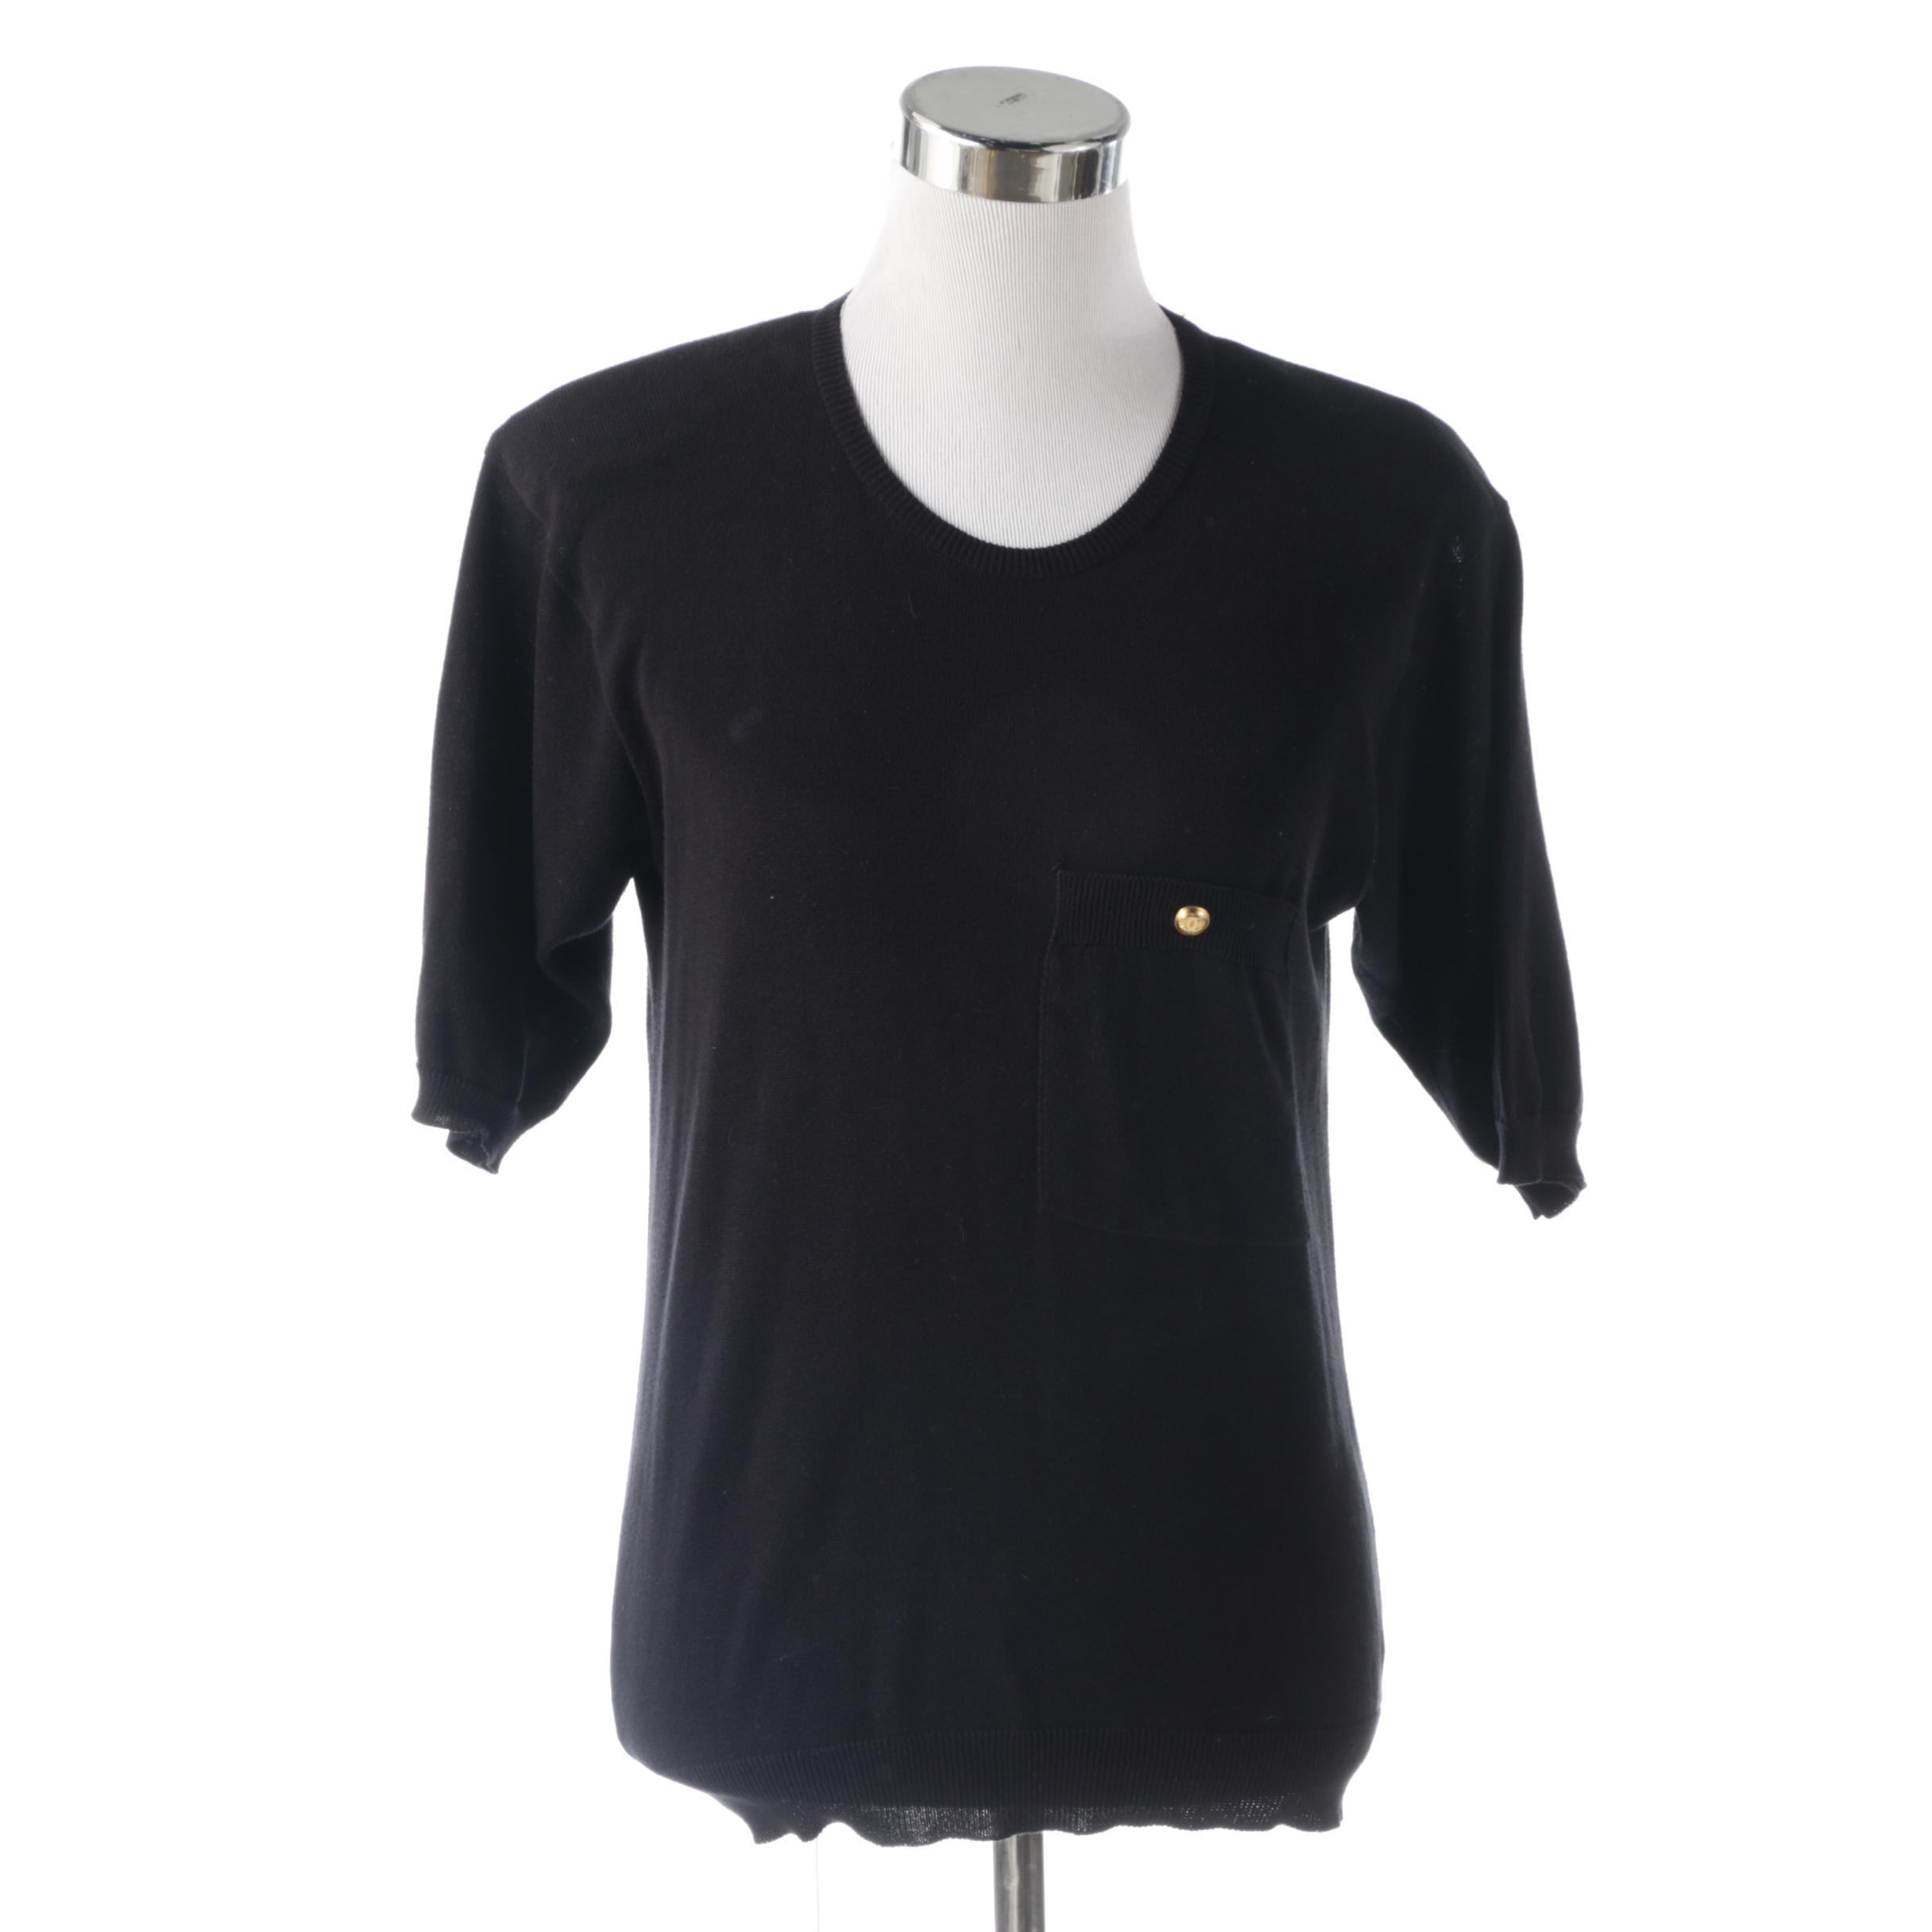 Chanel Black Cotton Knit Sweater, Vintage